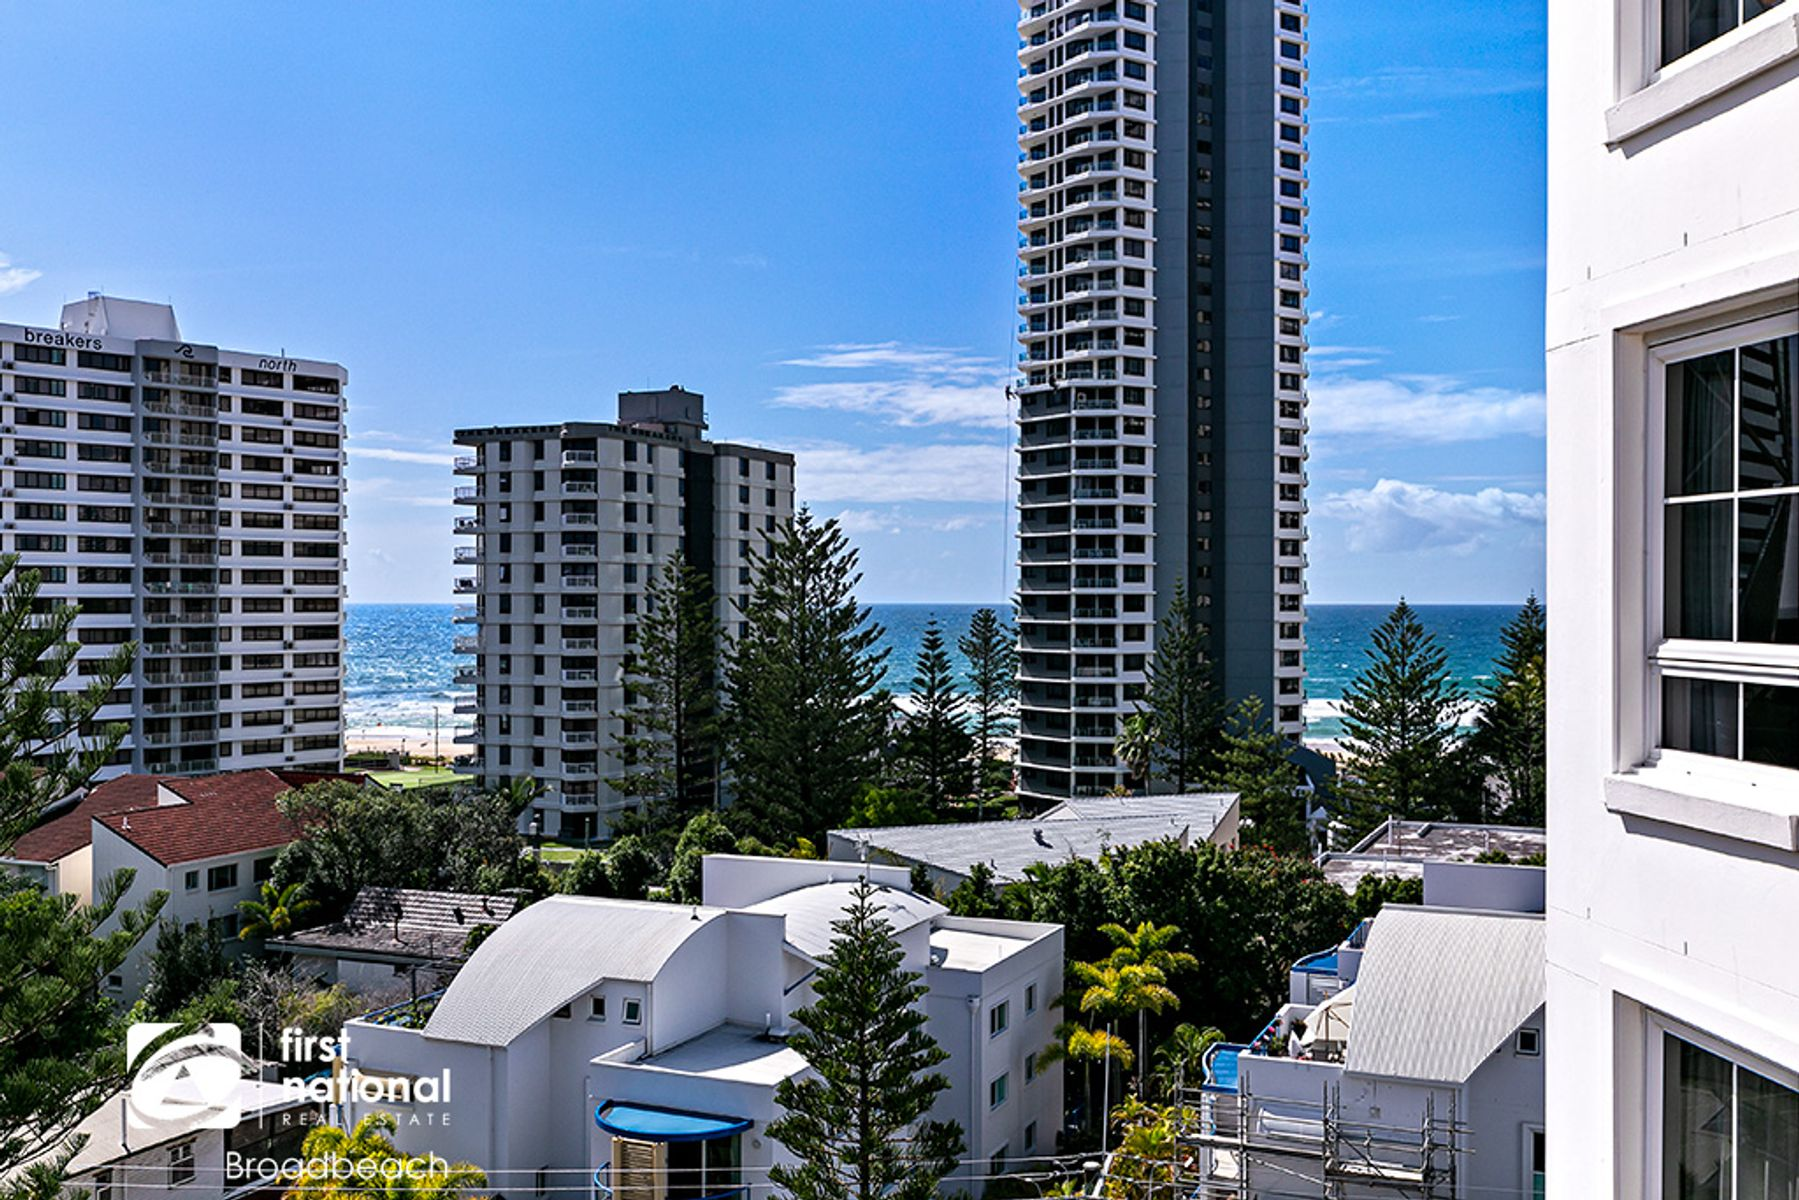 804/9-21 Beach Parade, Surfers Paradise, QLD 4217